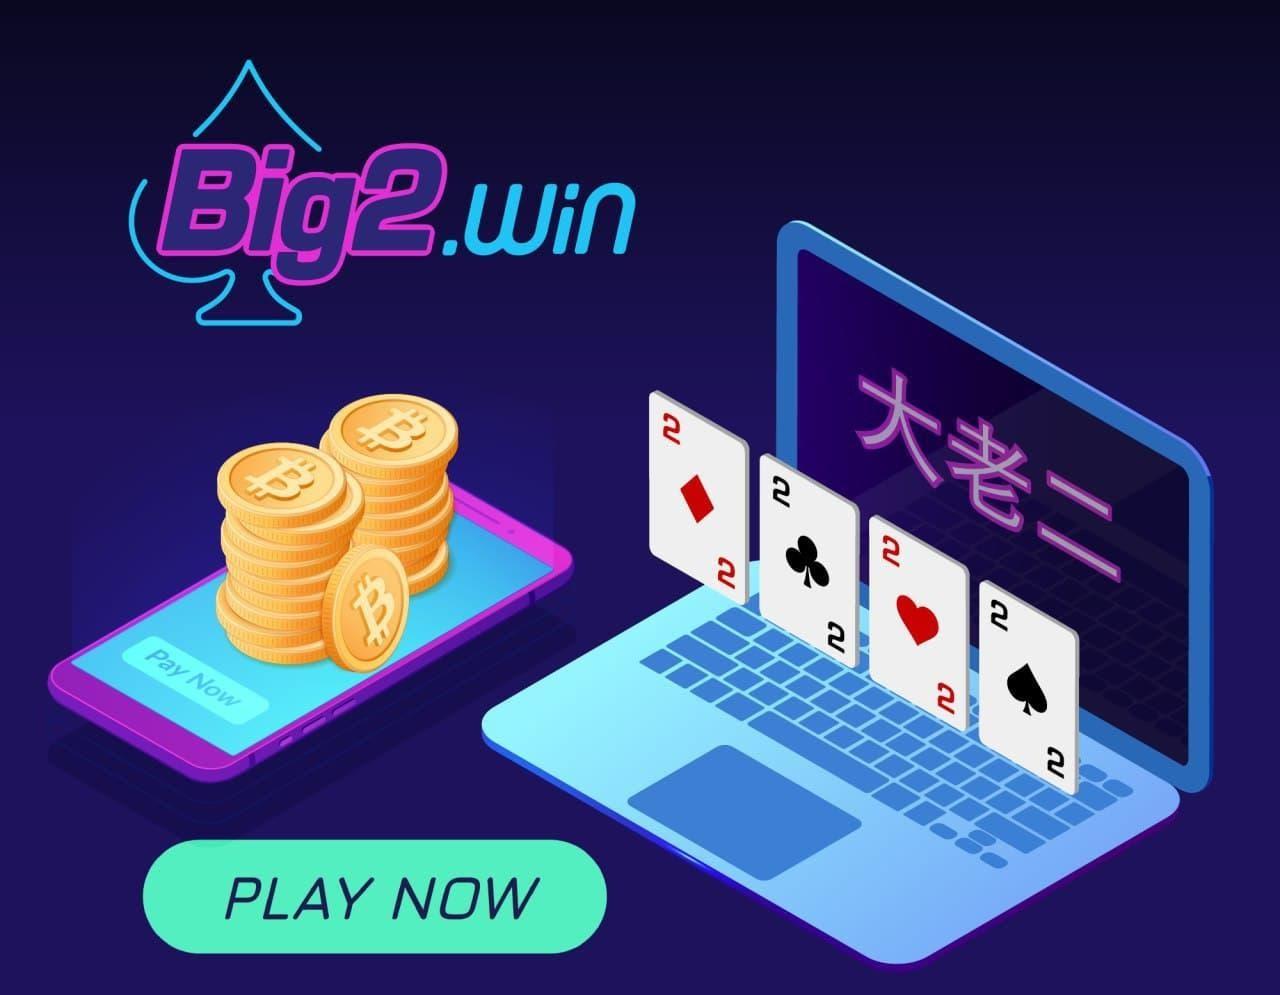 BIG2.WIN Makes Waves on Peer-to-Peer Crypto Gaming Market via Entertaining Game